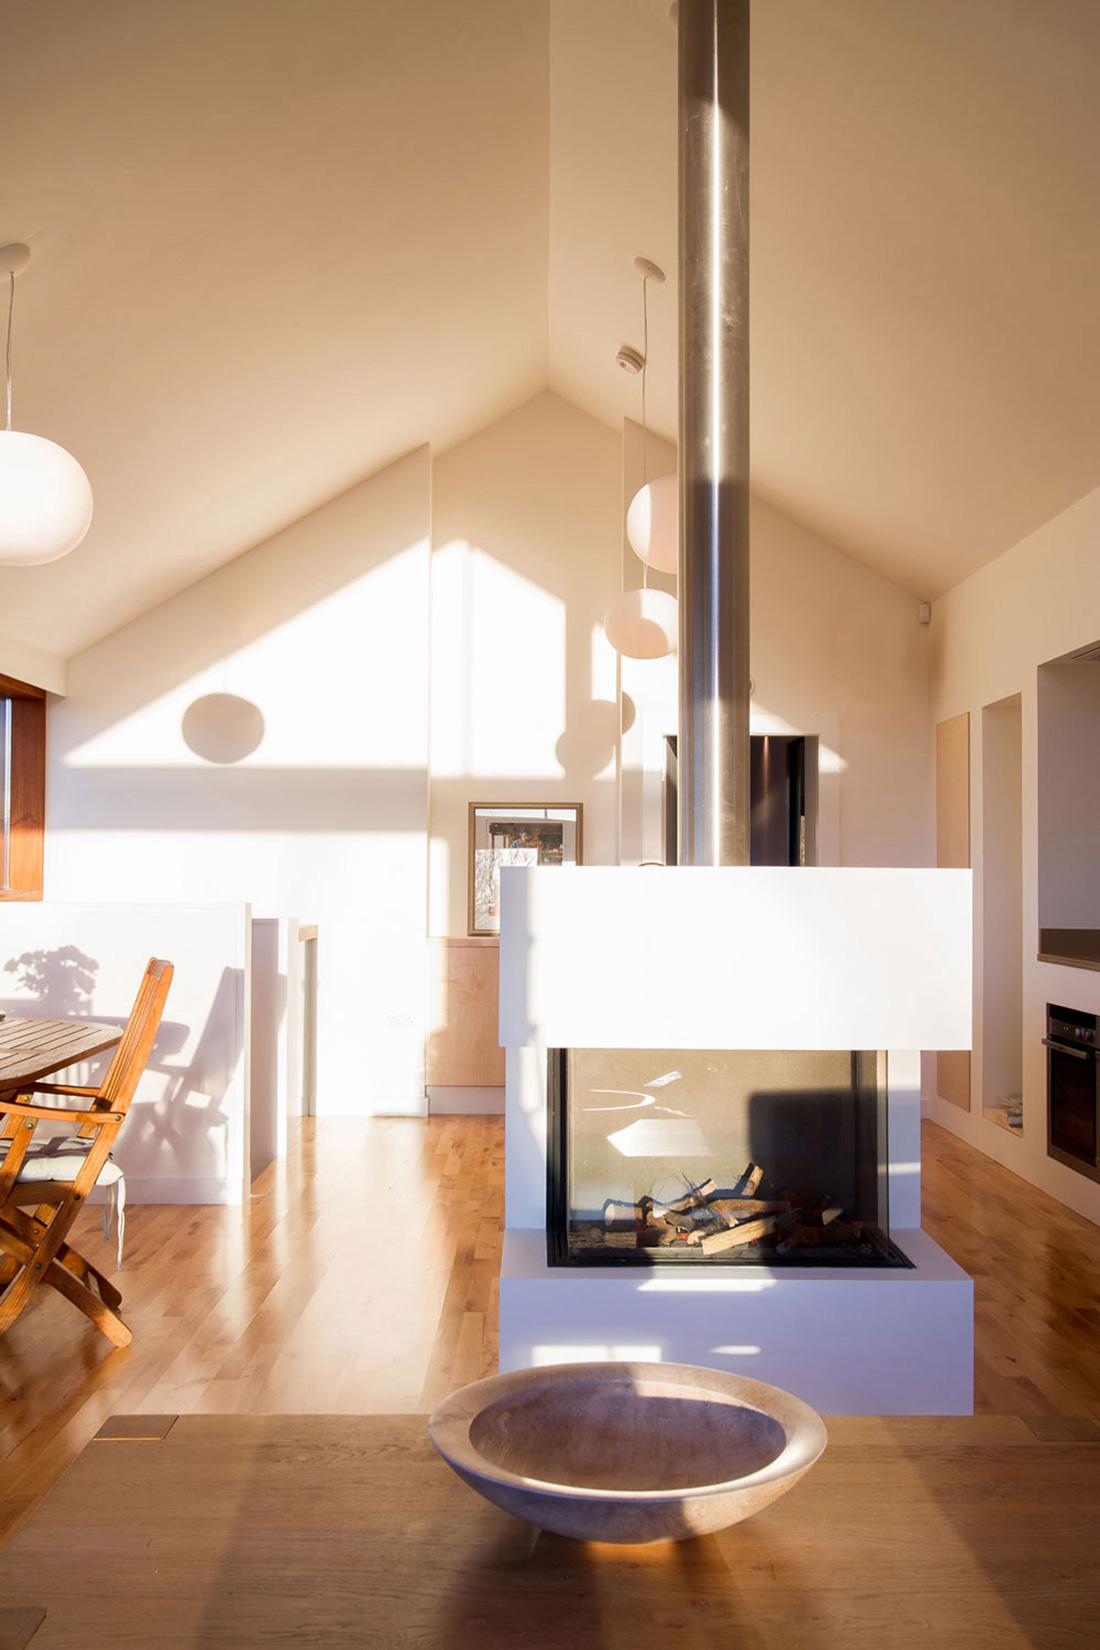 Garden Furniture Ni contemporary bedroom furniture northern ireland | deals garden